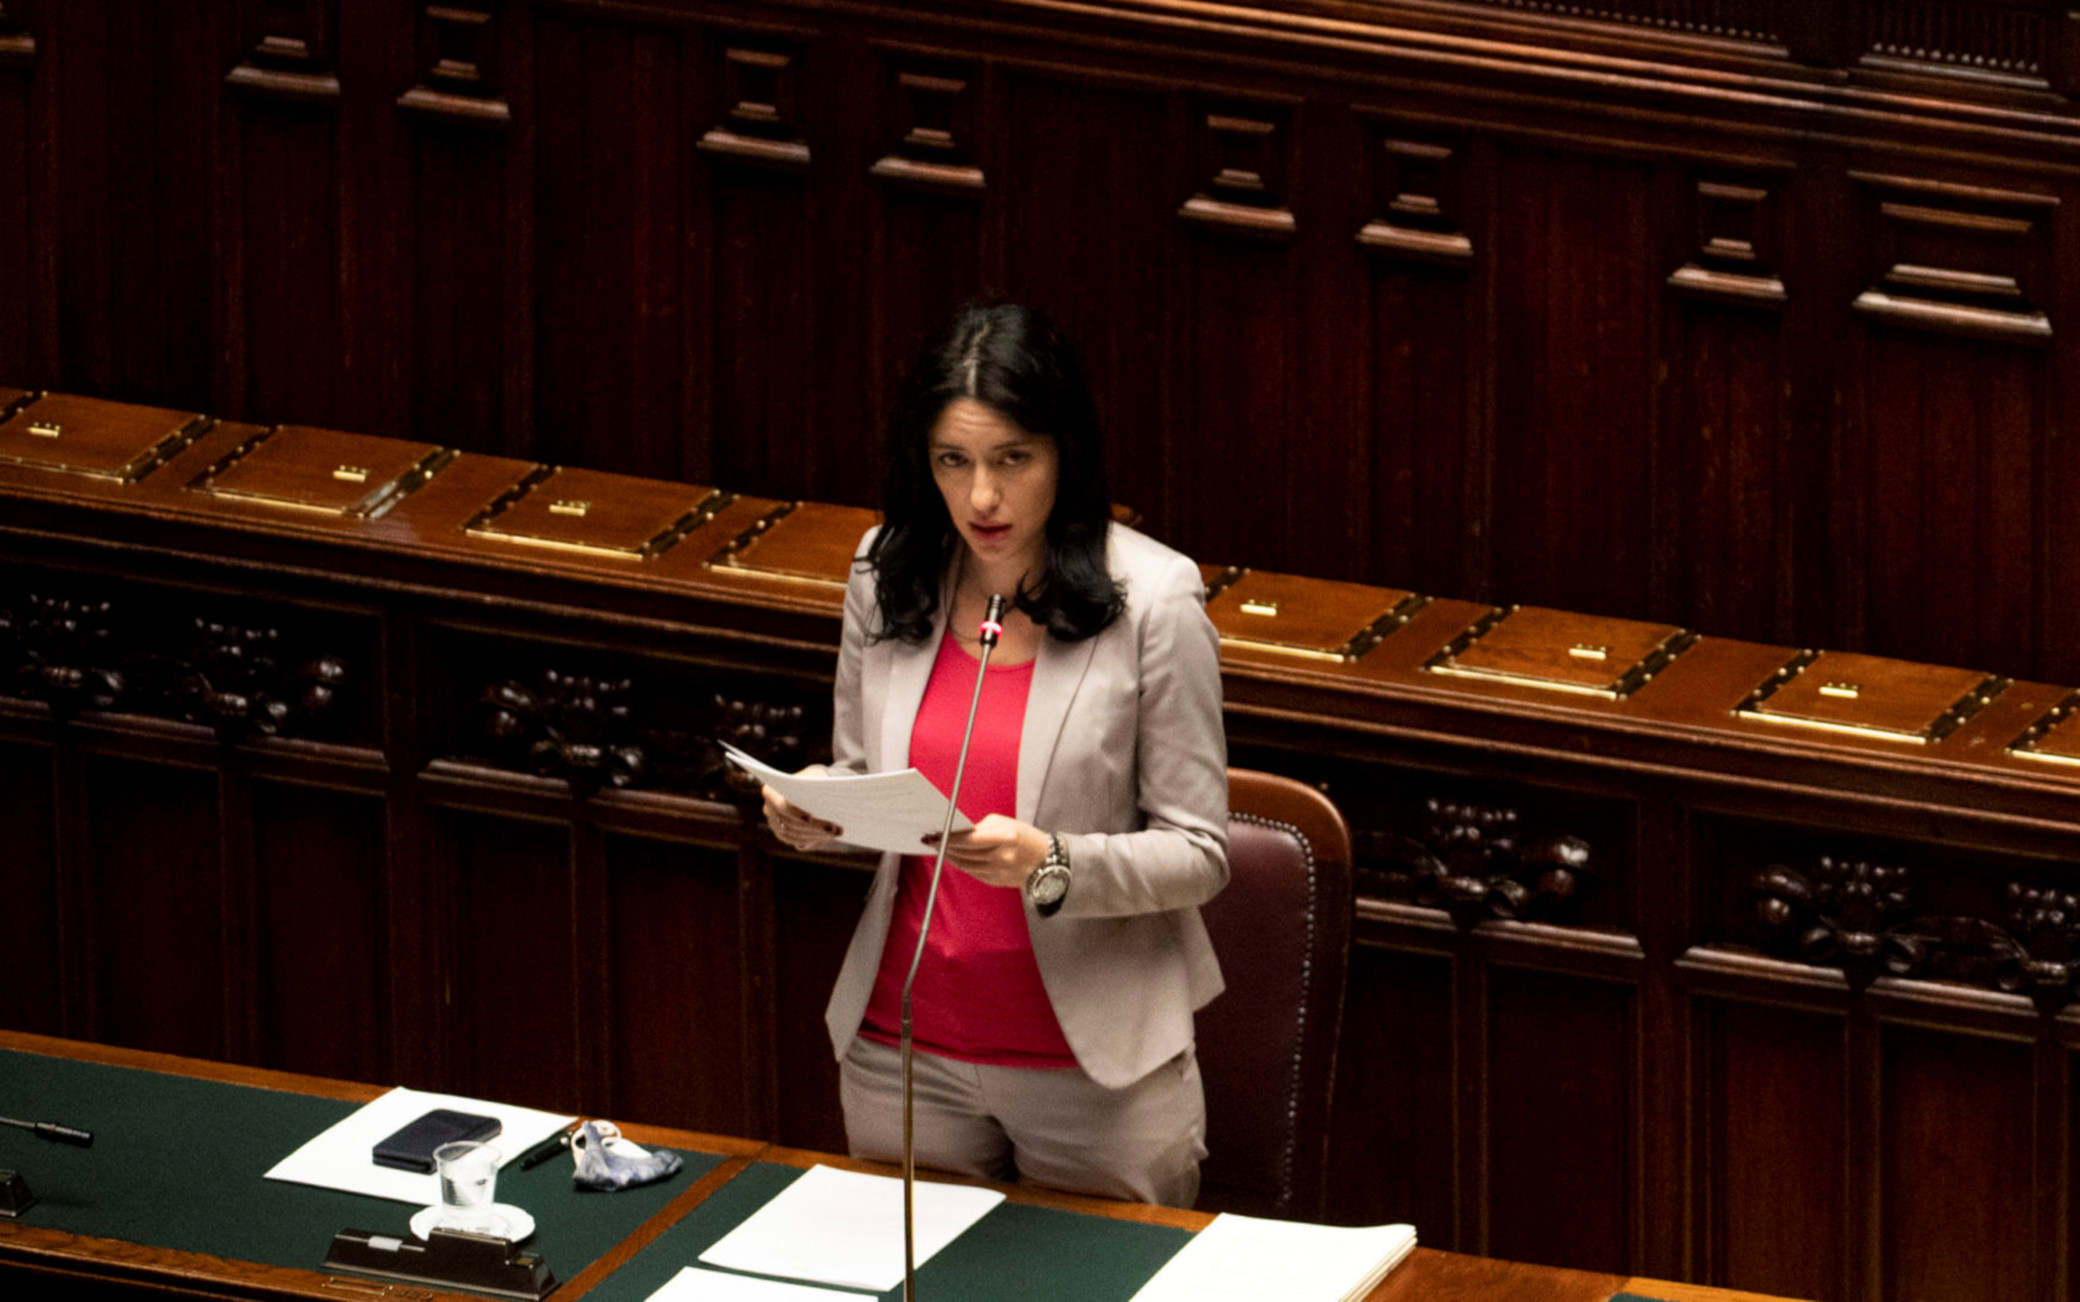 Ministra Lucia Azzolina